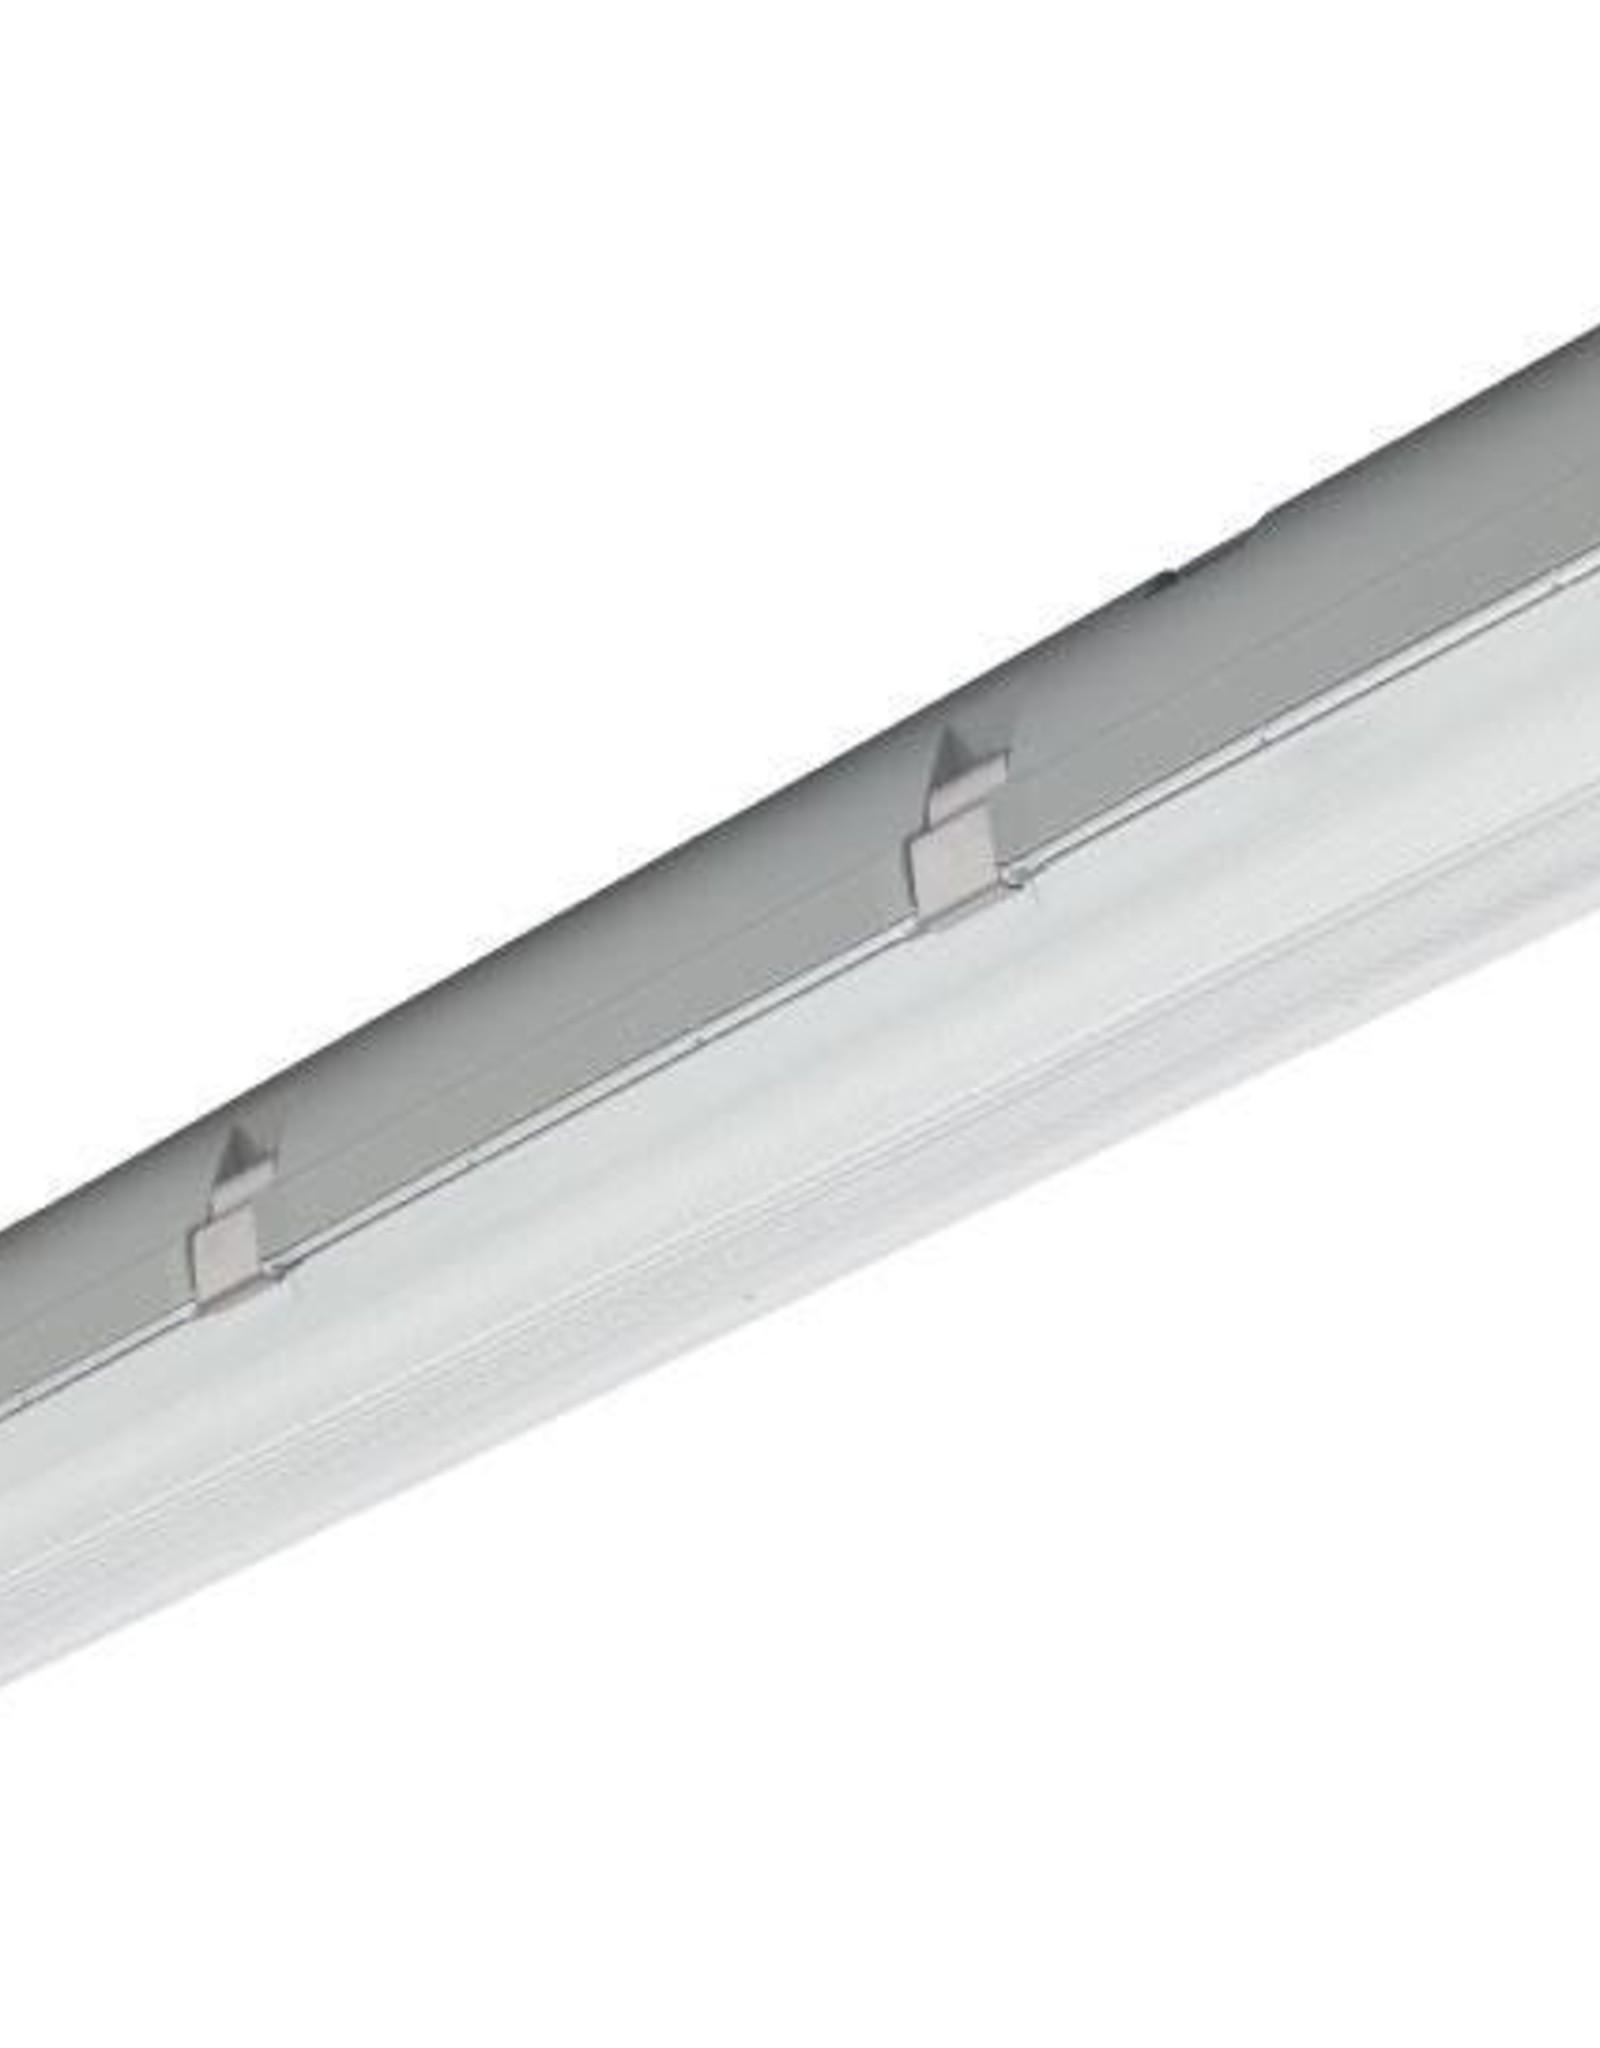 Prima 2x80W HO - ABS - inox clips - HF ballast